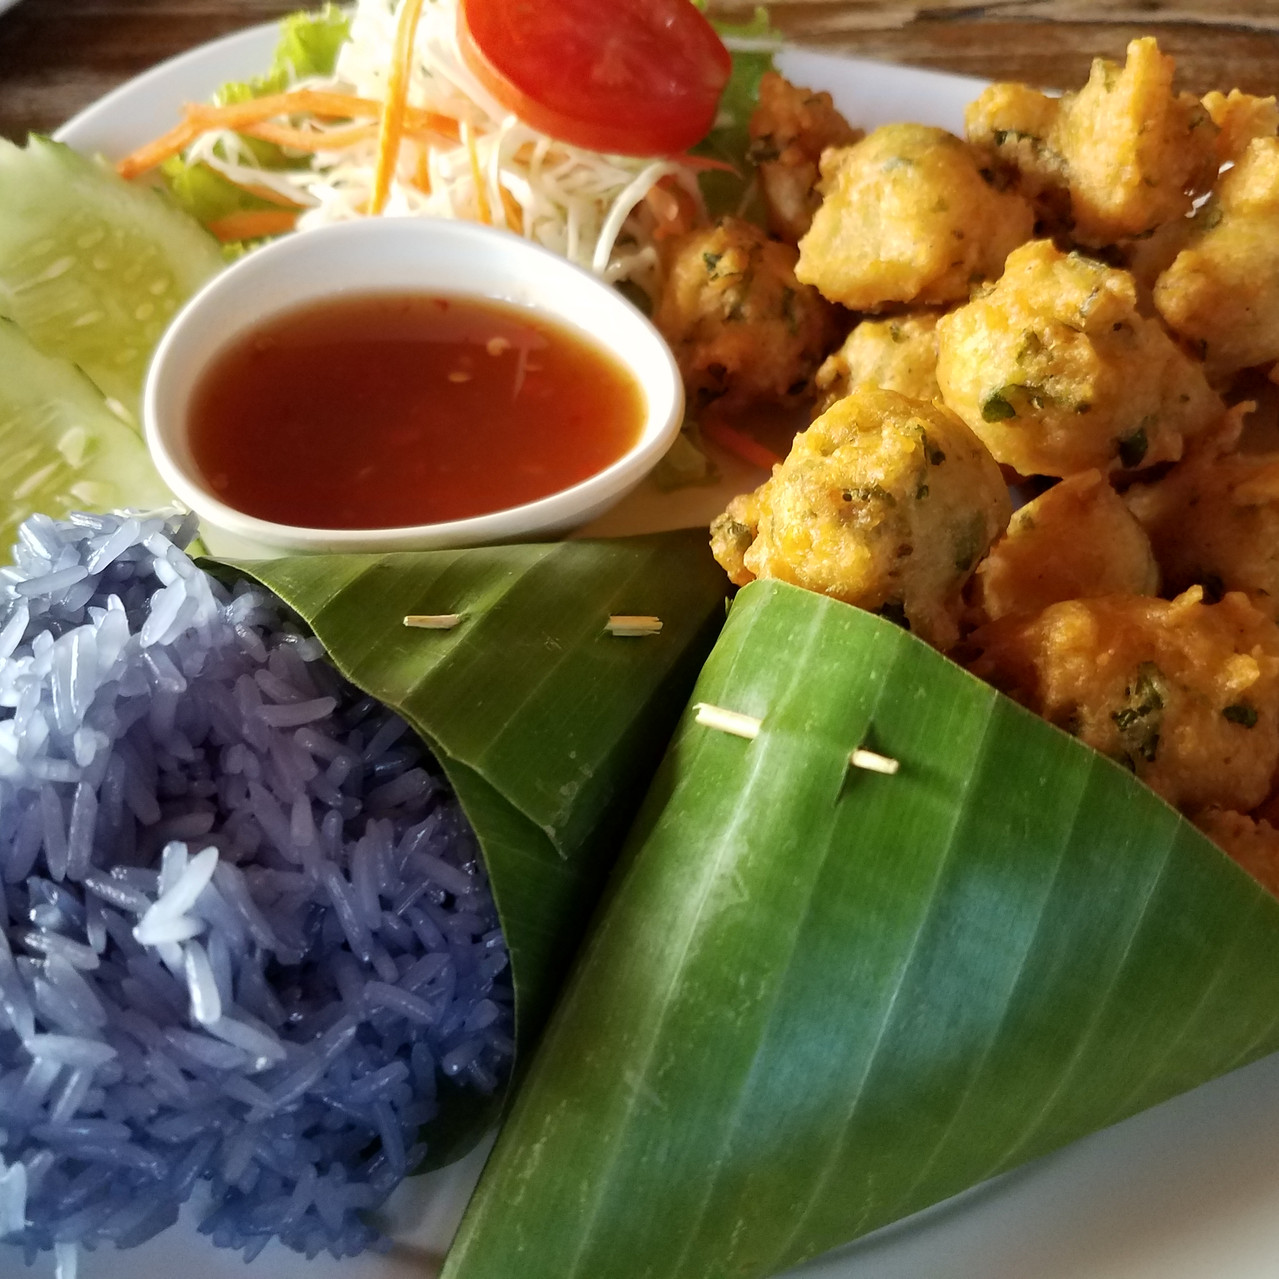 blue rice and potato balls at AUM restaurant, Chiang Mai